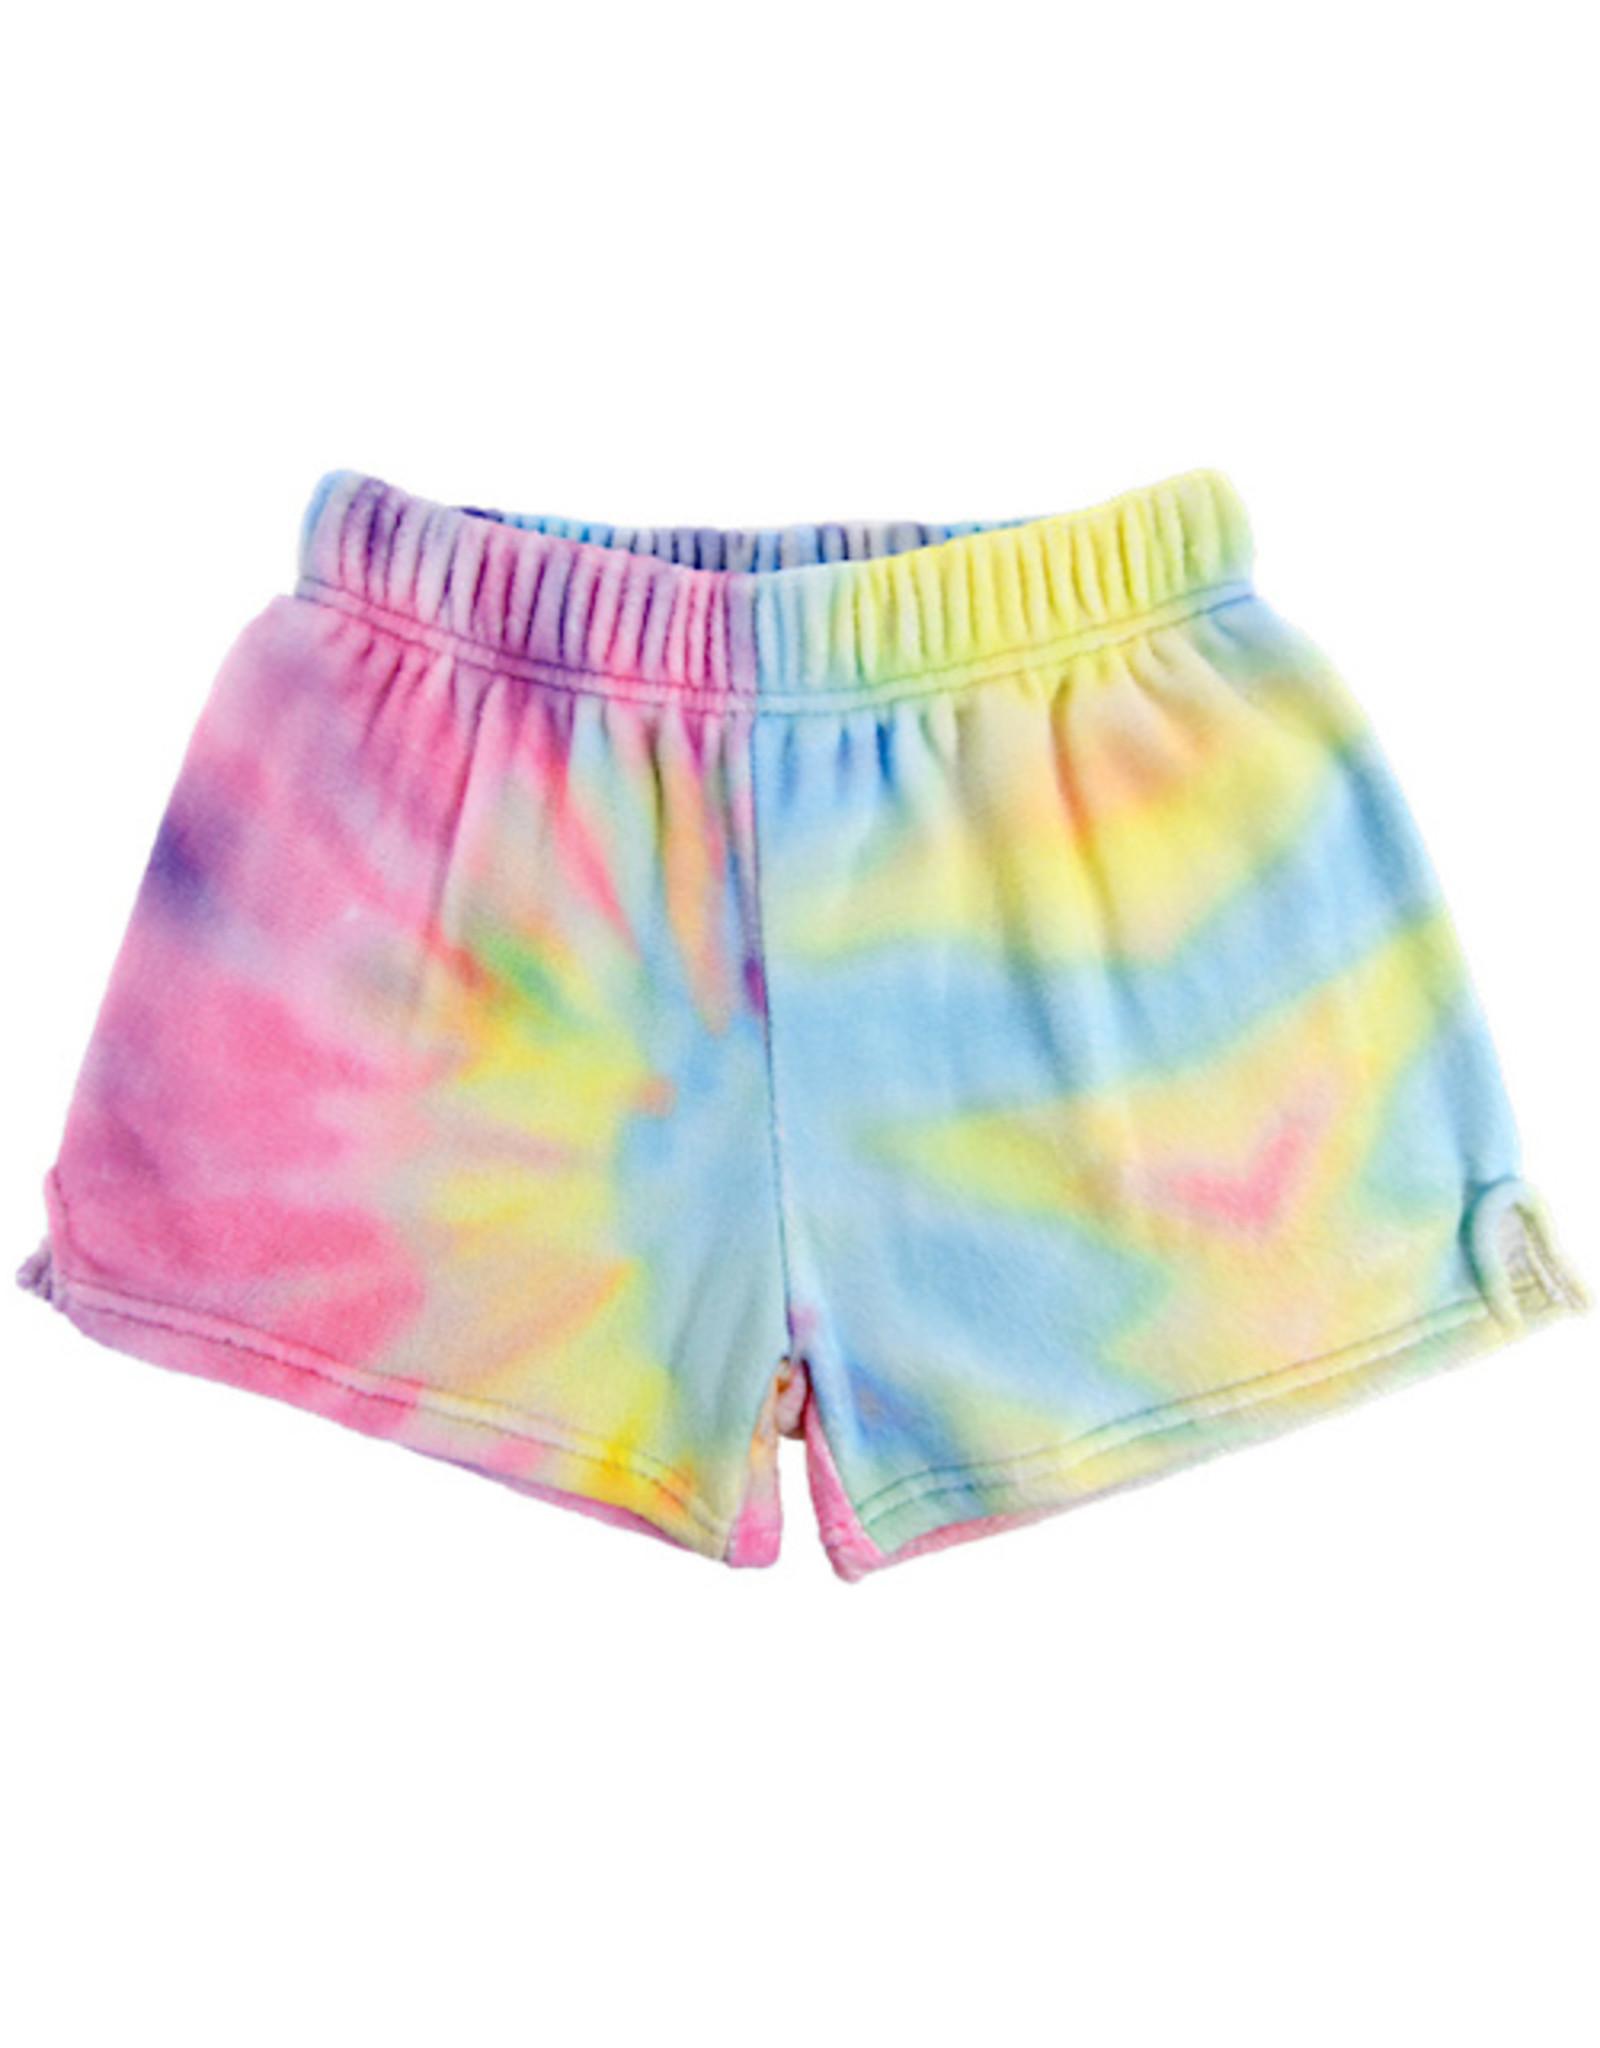 Iscream Pastel Tie Dye Plush Shorts